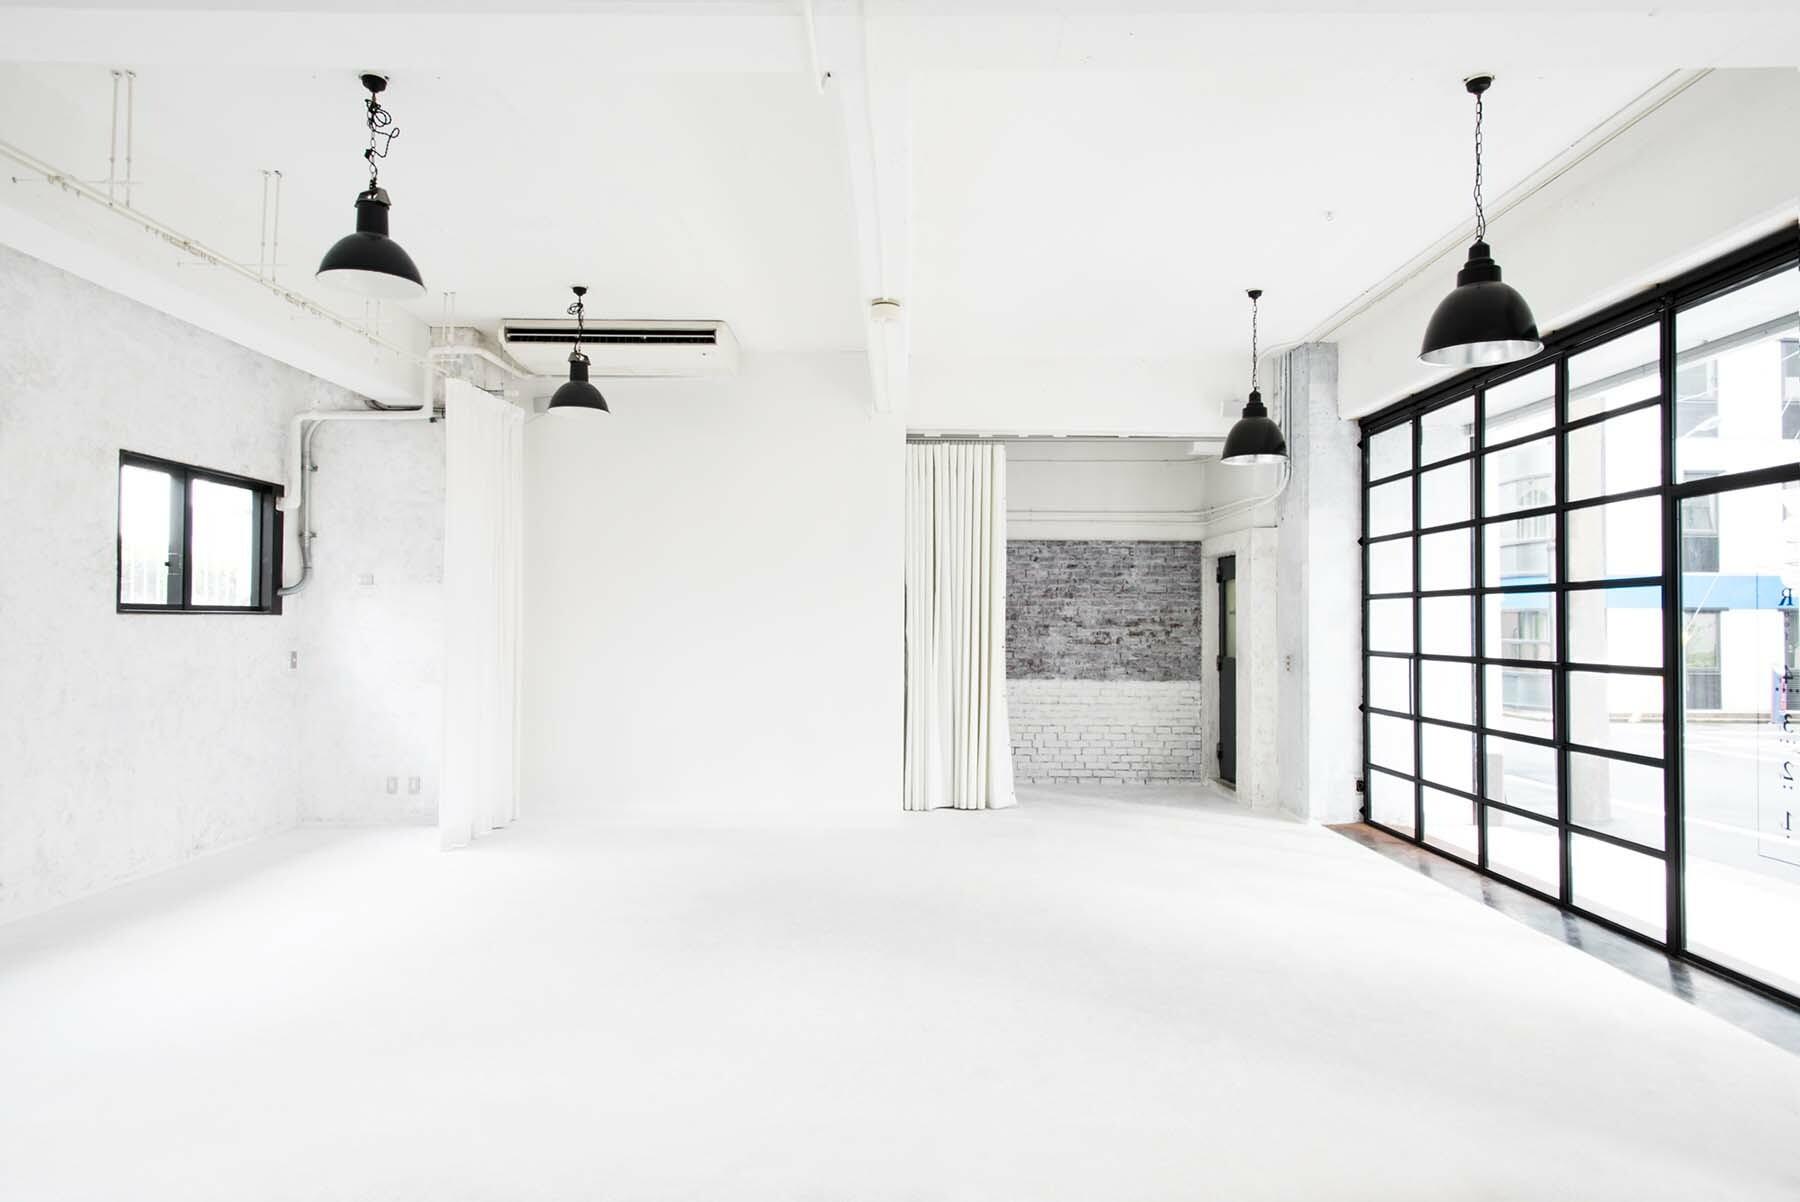 StudioBRICK 1F (スタジオブリック八丁堀1F)天井高は3.6m